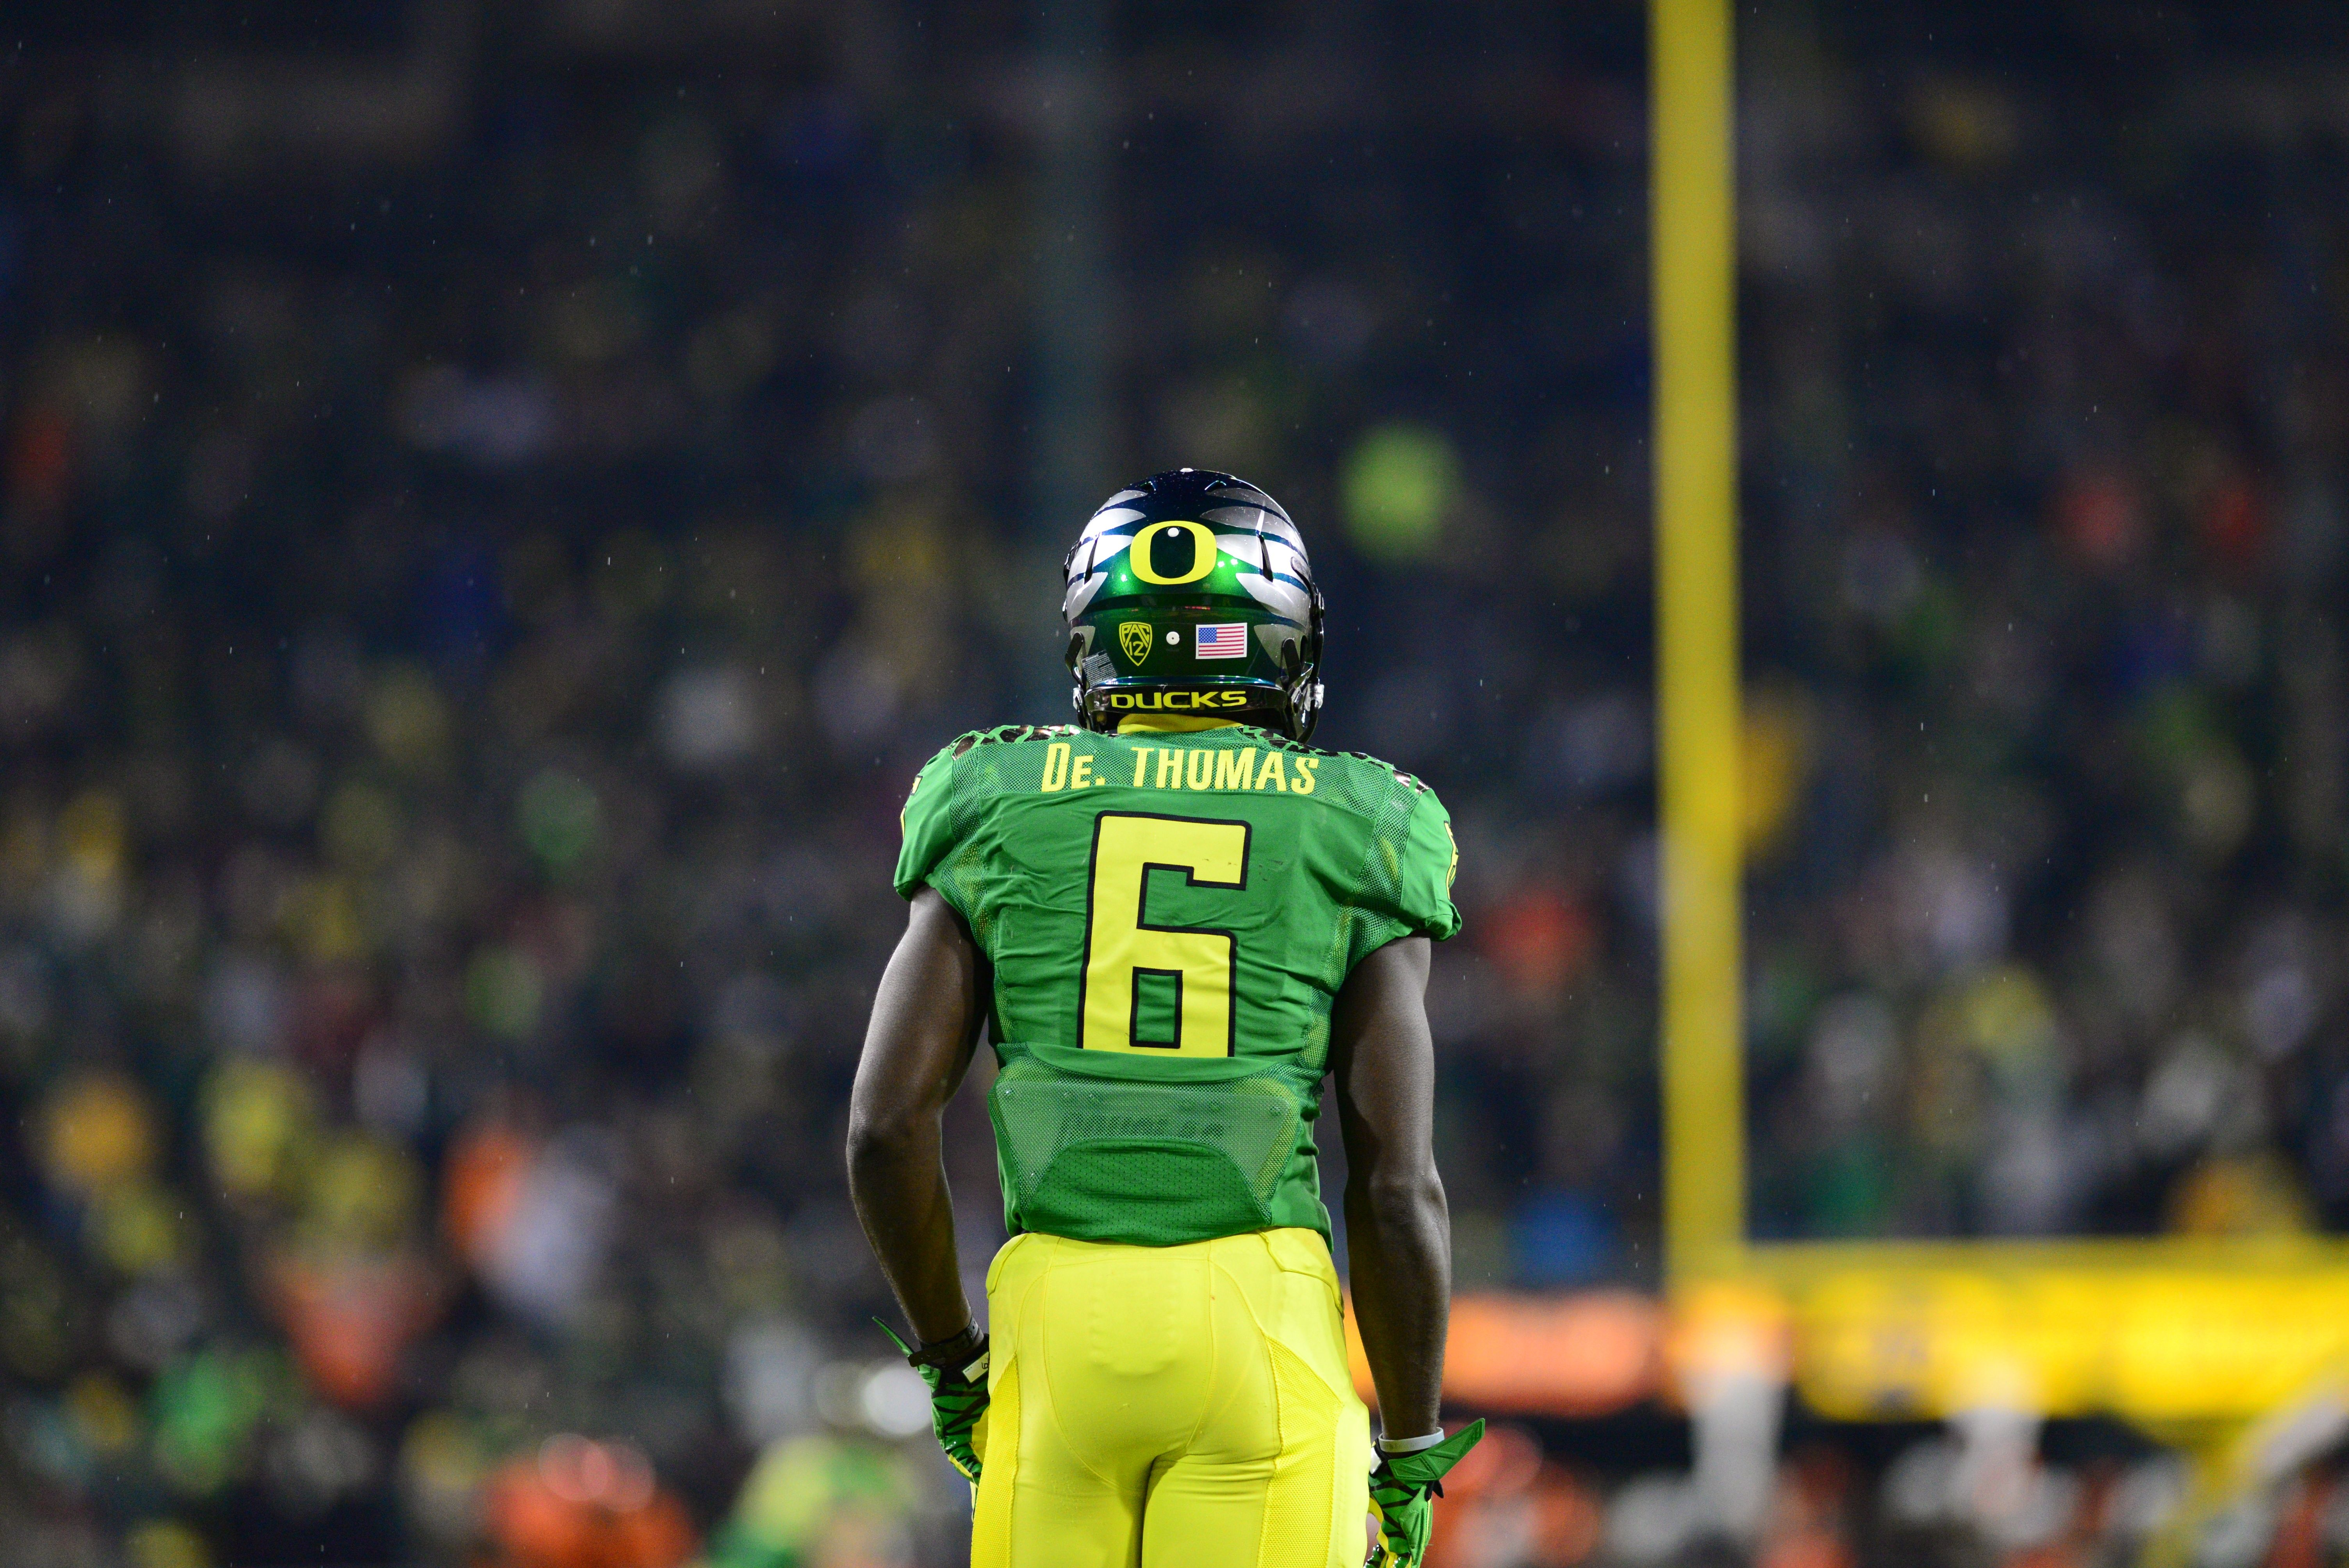 Former University Of Oregon Ducks All Purpose Back De Anthony Thomas Goducks Photo By Chris Poulson Oregon Football Oregon Ducks Football Ducks Football